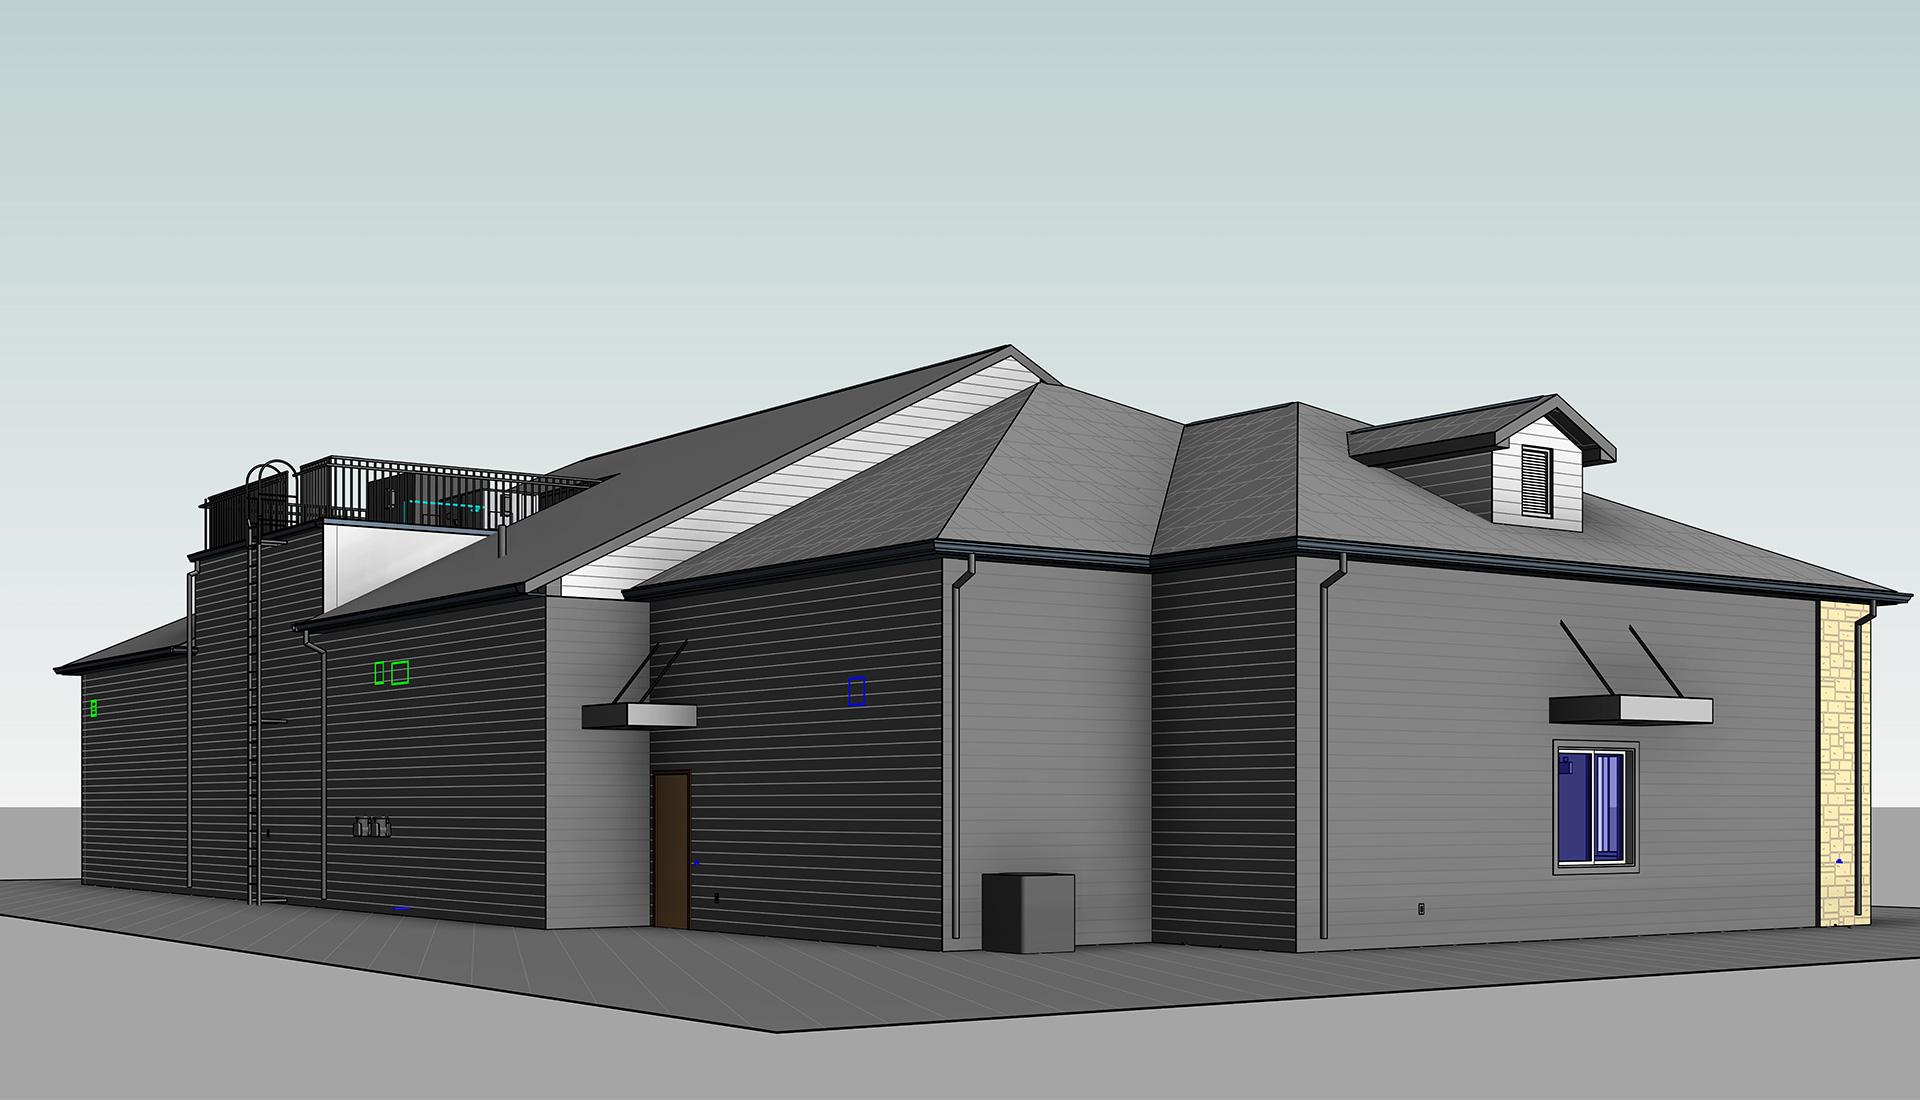 Architectural_Revit_Modeling-Silver-lane-Gas-Station-BIM-Project-by-United-BIM